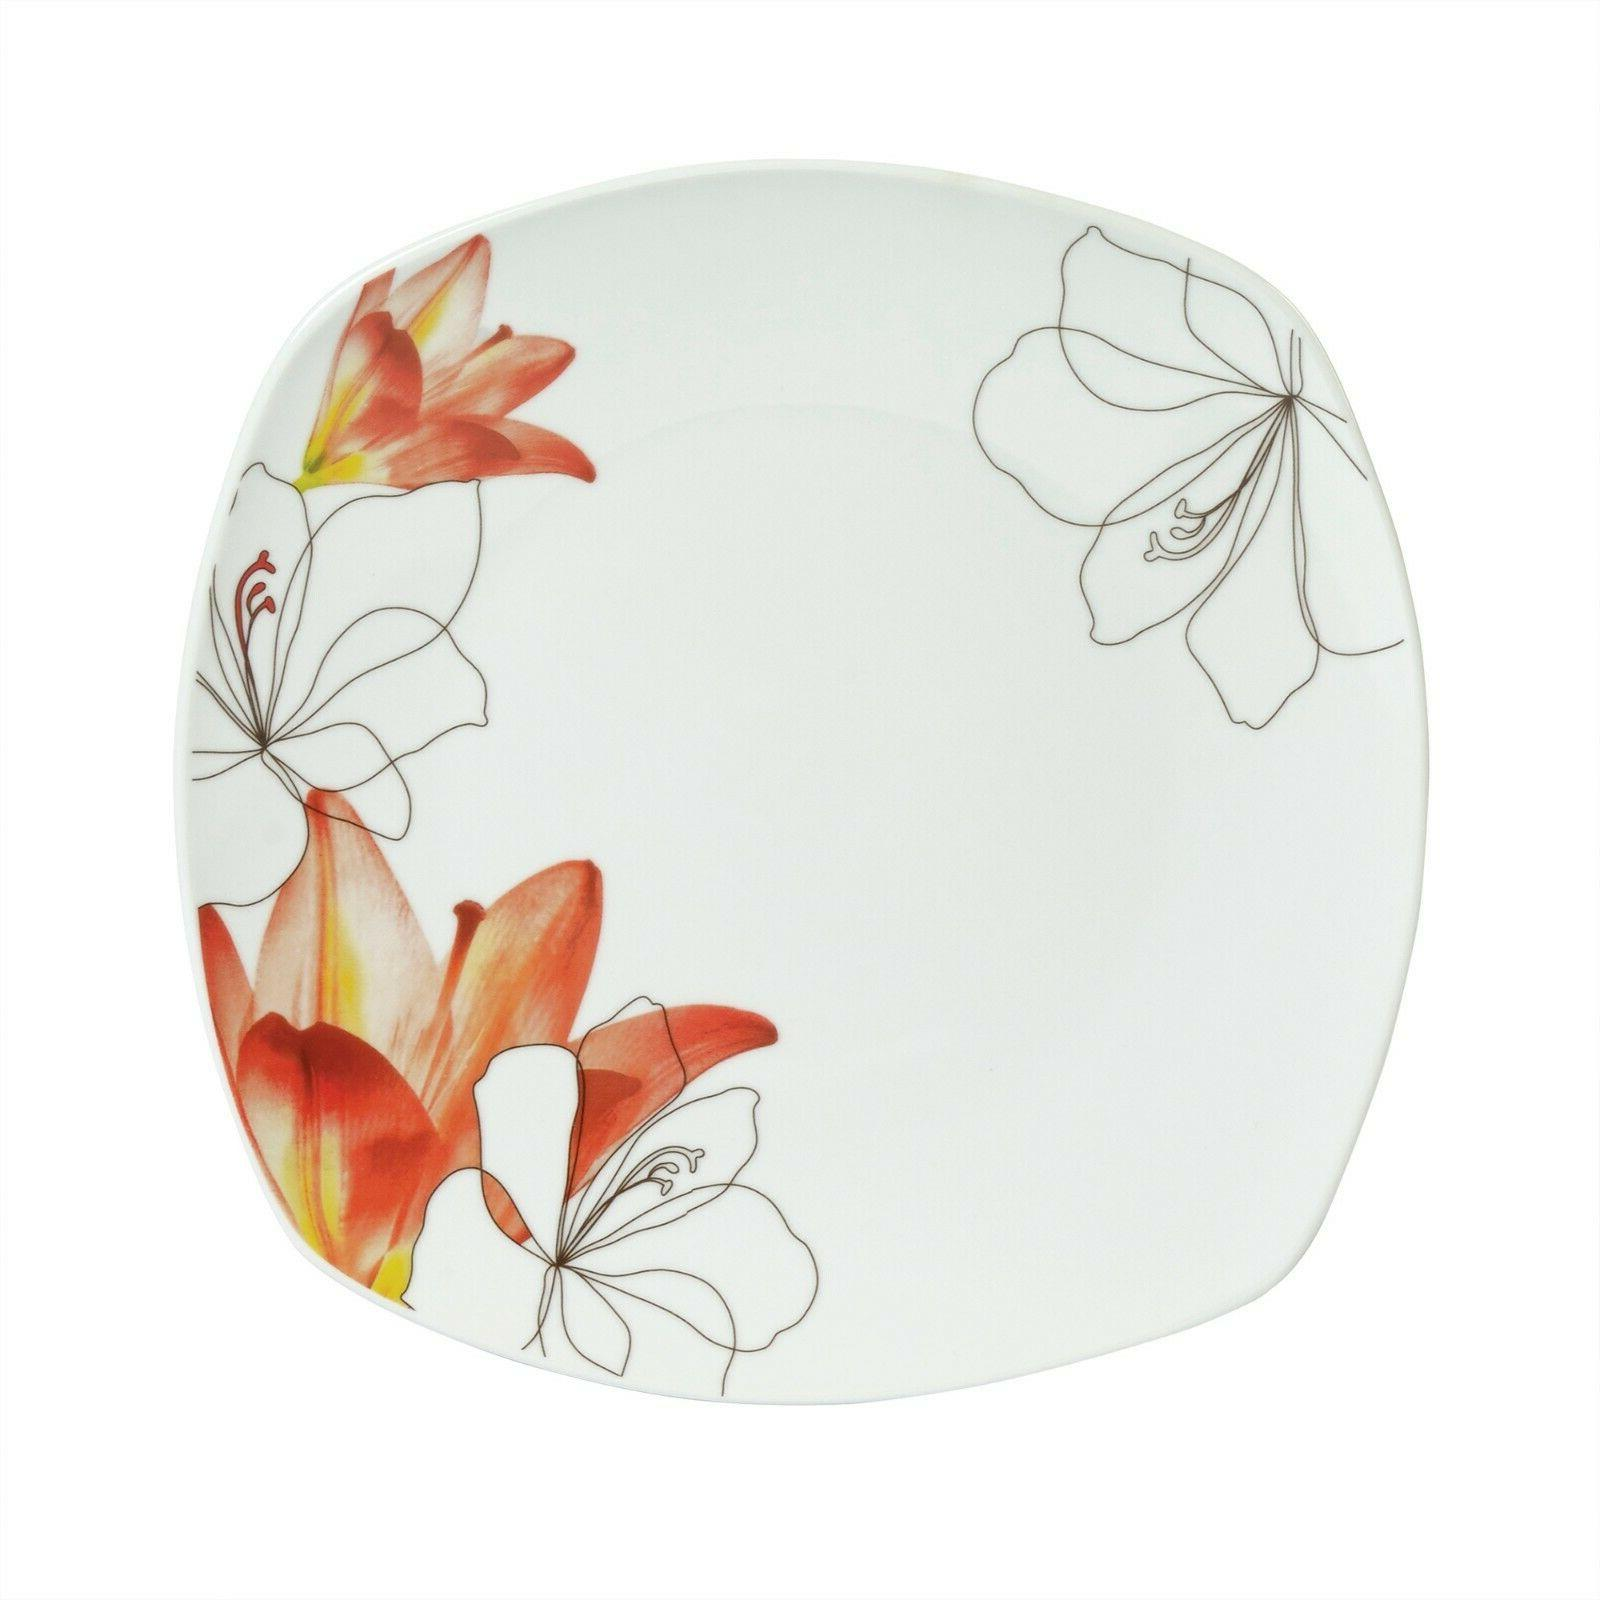 16 Piece Autumn Set Square Dishwasher Freezer Microwave Ceramic